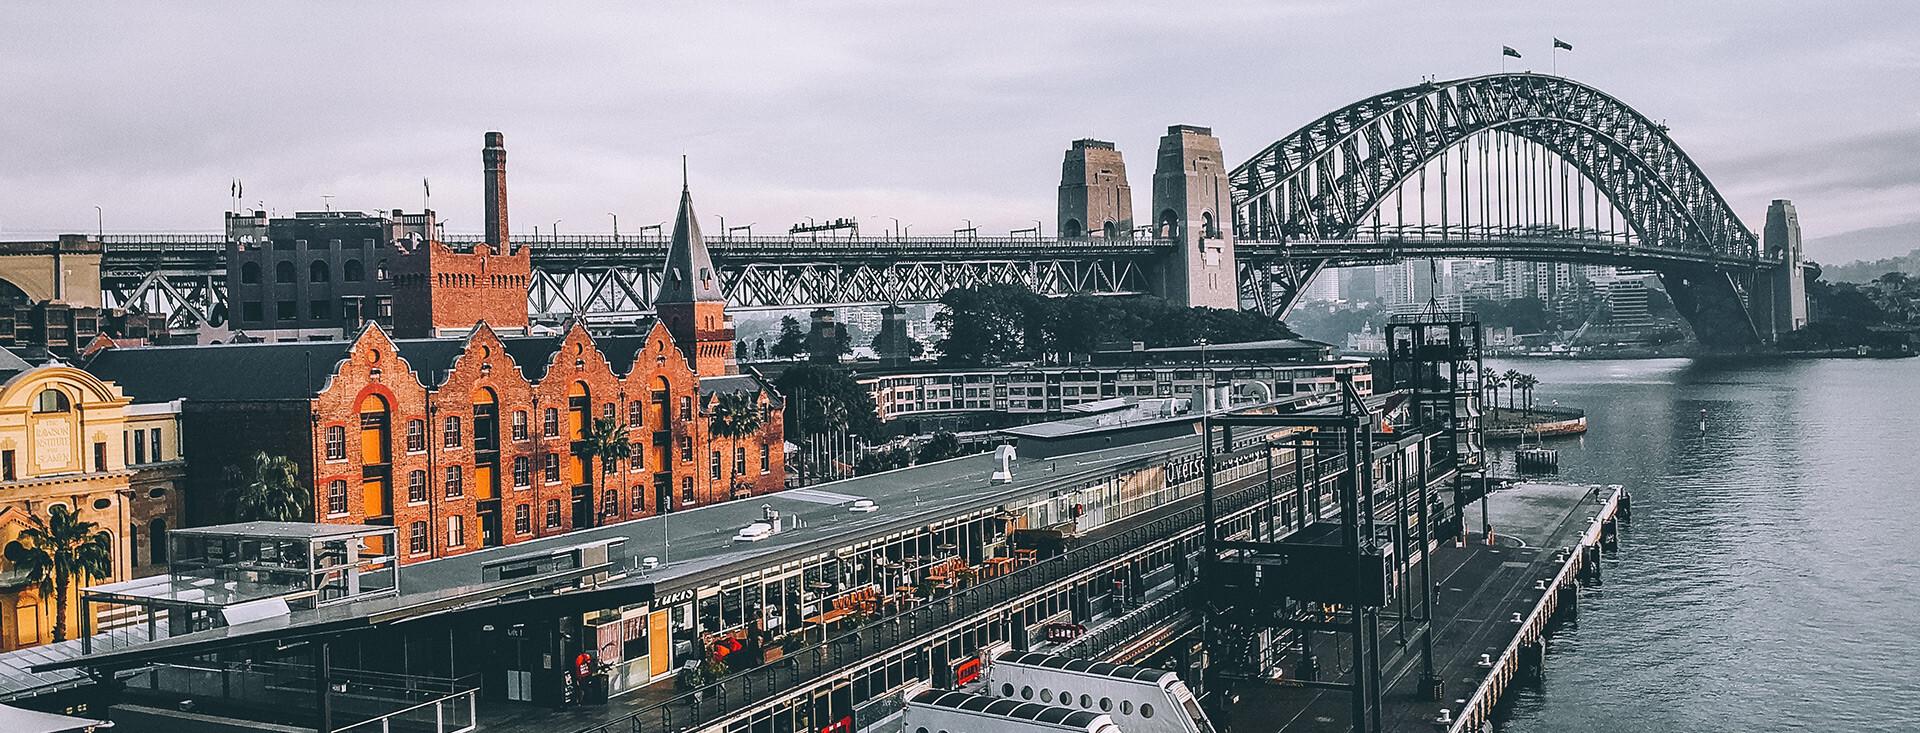 Sydney Harbour Bridge and Rocks